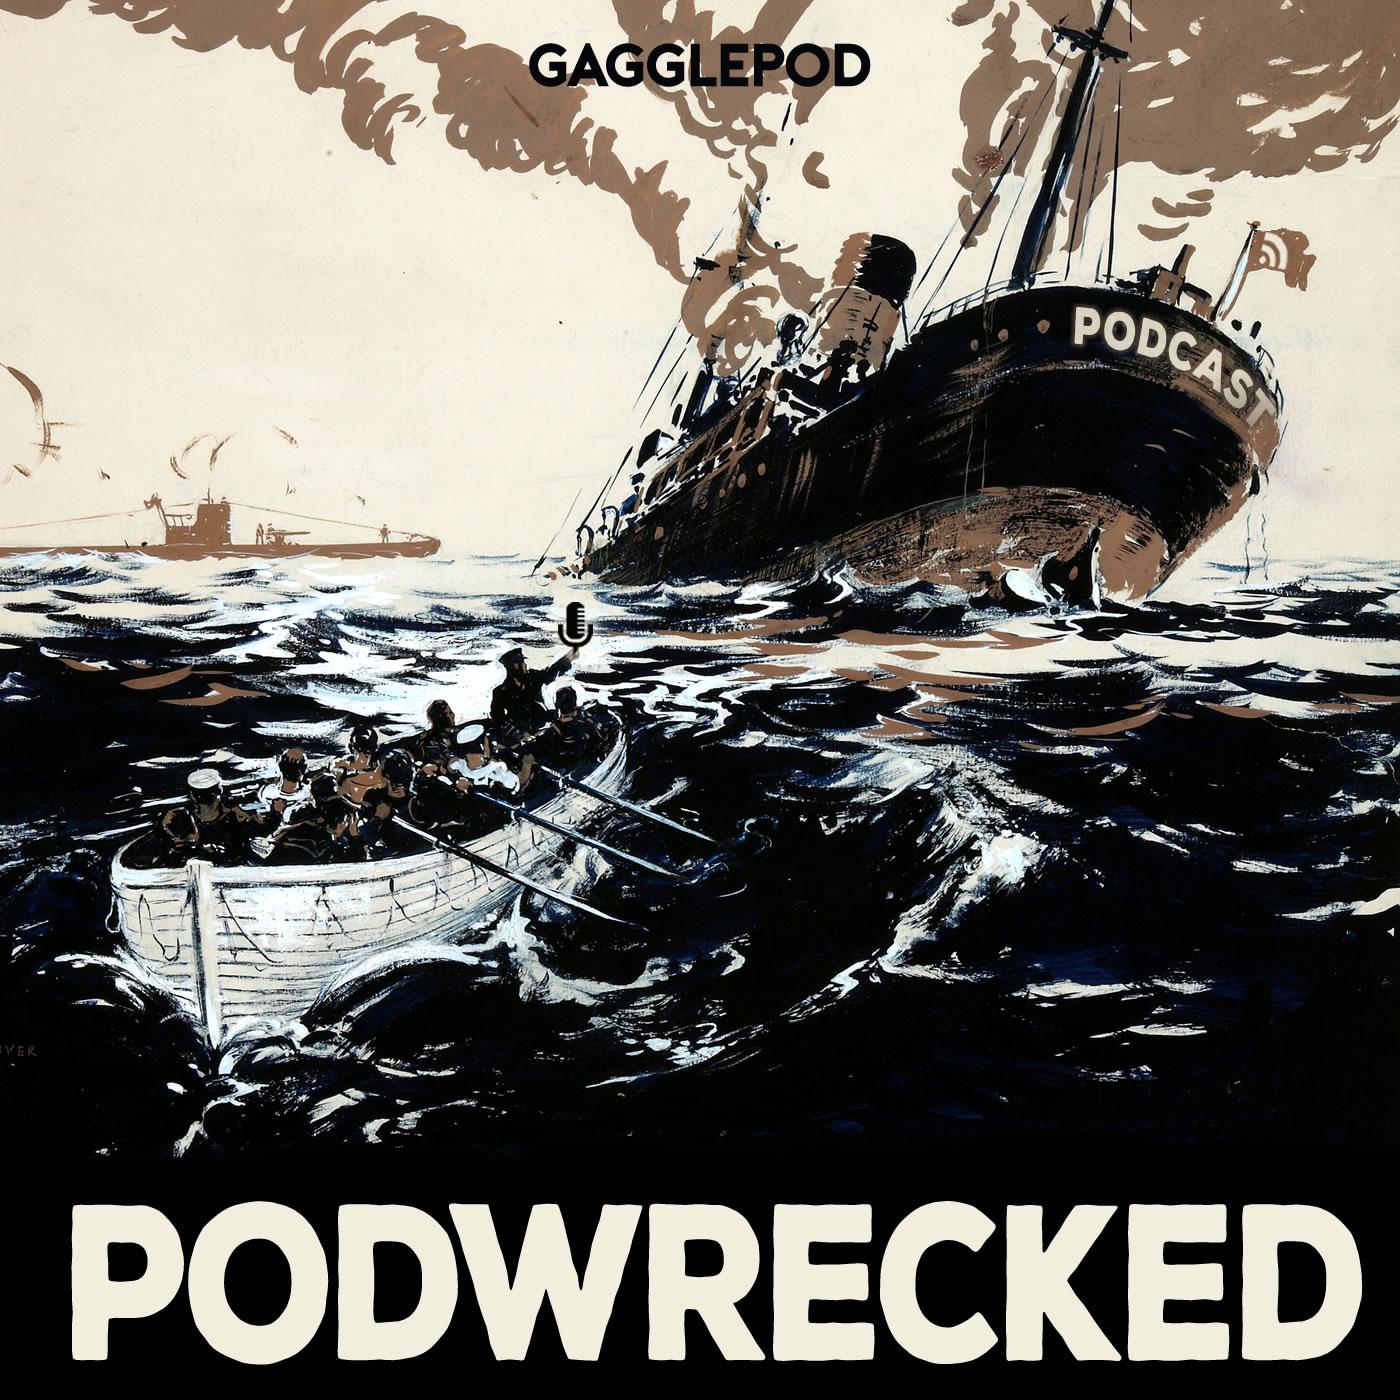 Podwrecked show art